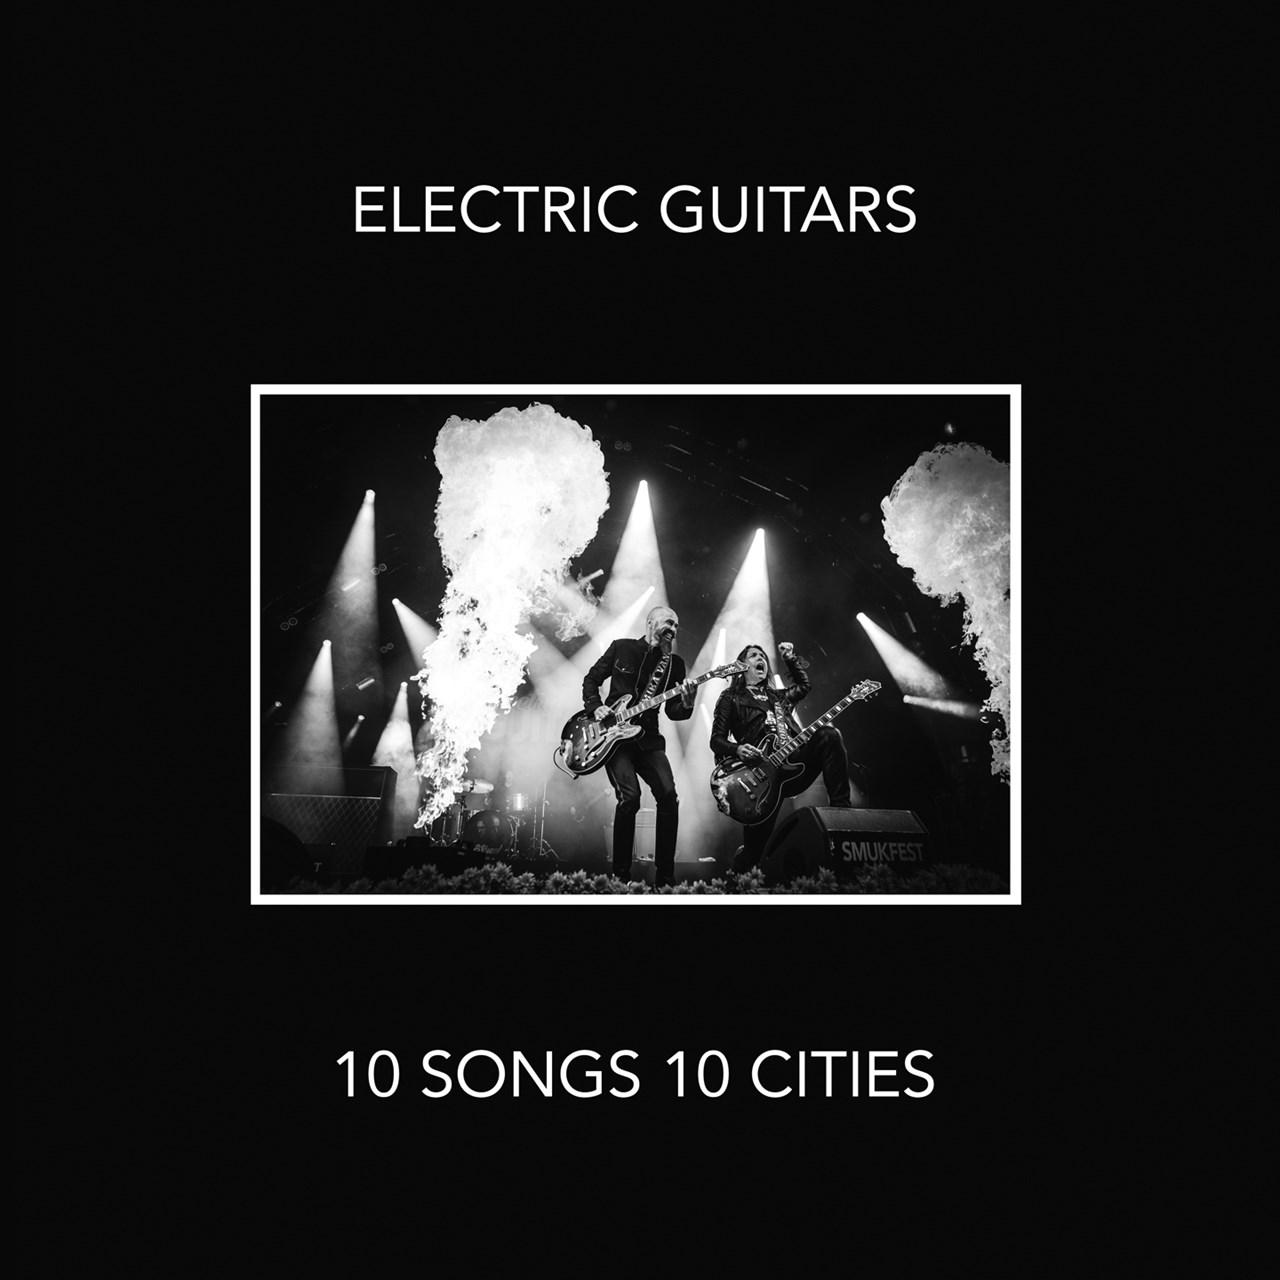 10 Songs 10 Cities - 1